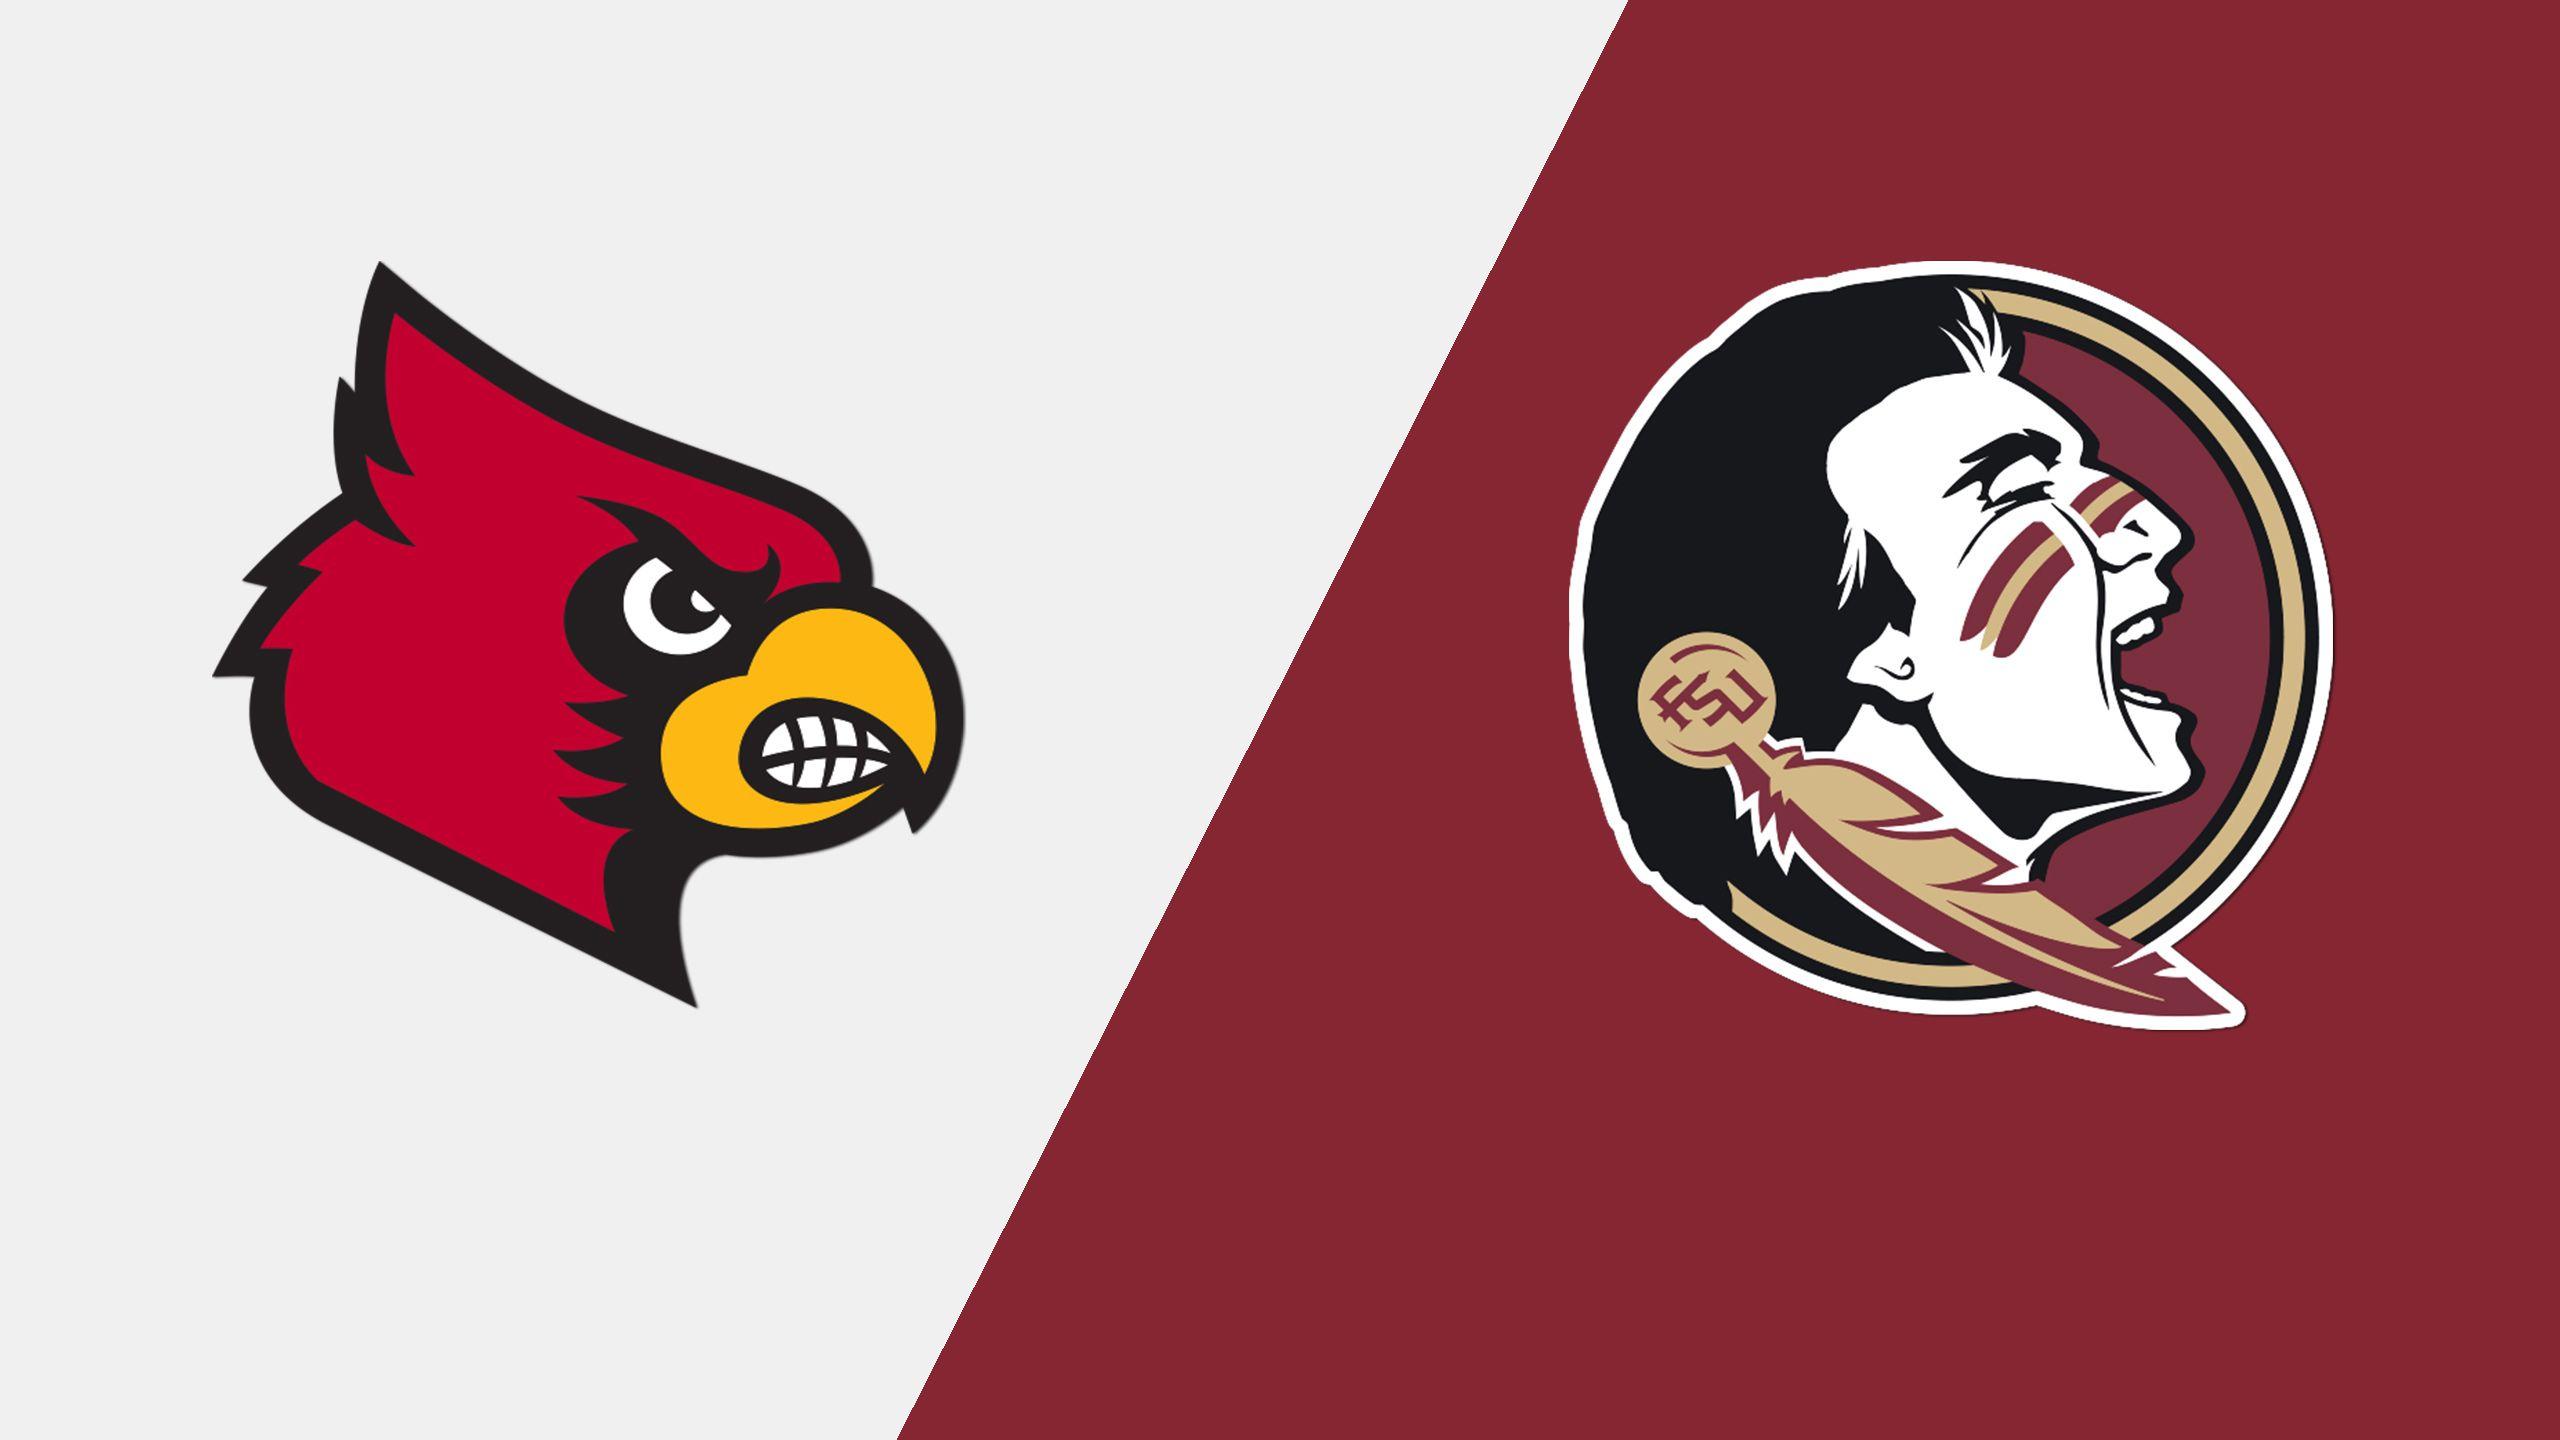 #25 Louisville vs. #10 Florida State (Championship) (ACC Baseball Championship)